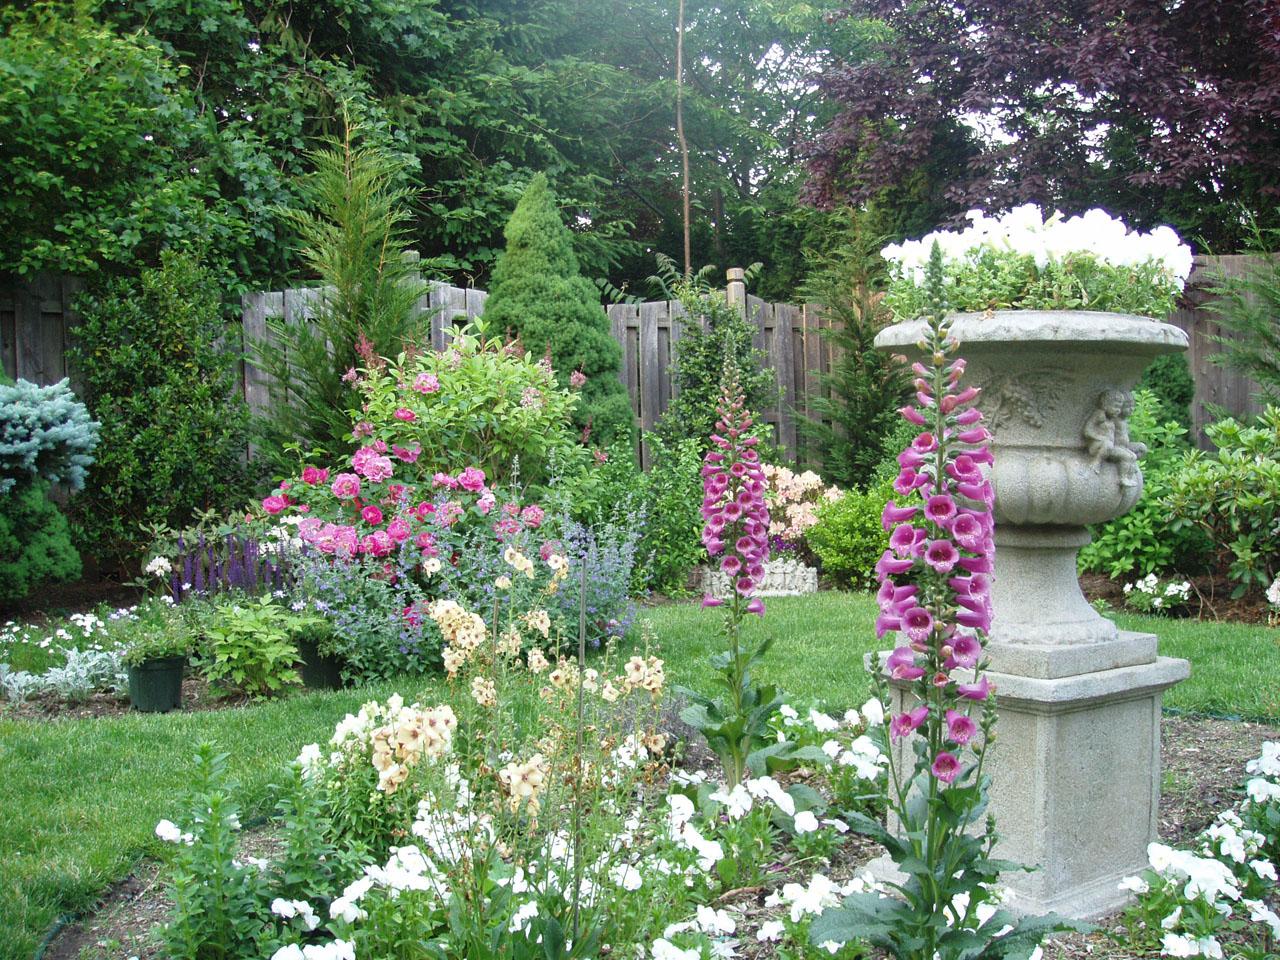 English garden wallpaper, wallpaper - Best 2 Travel Wallpaper on Backyard Landscape  id=84262